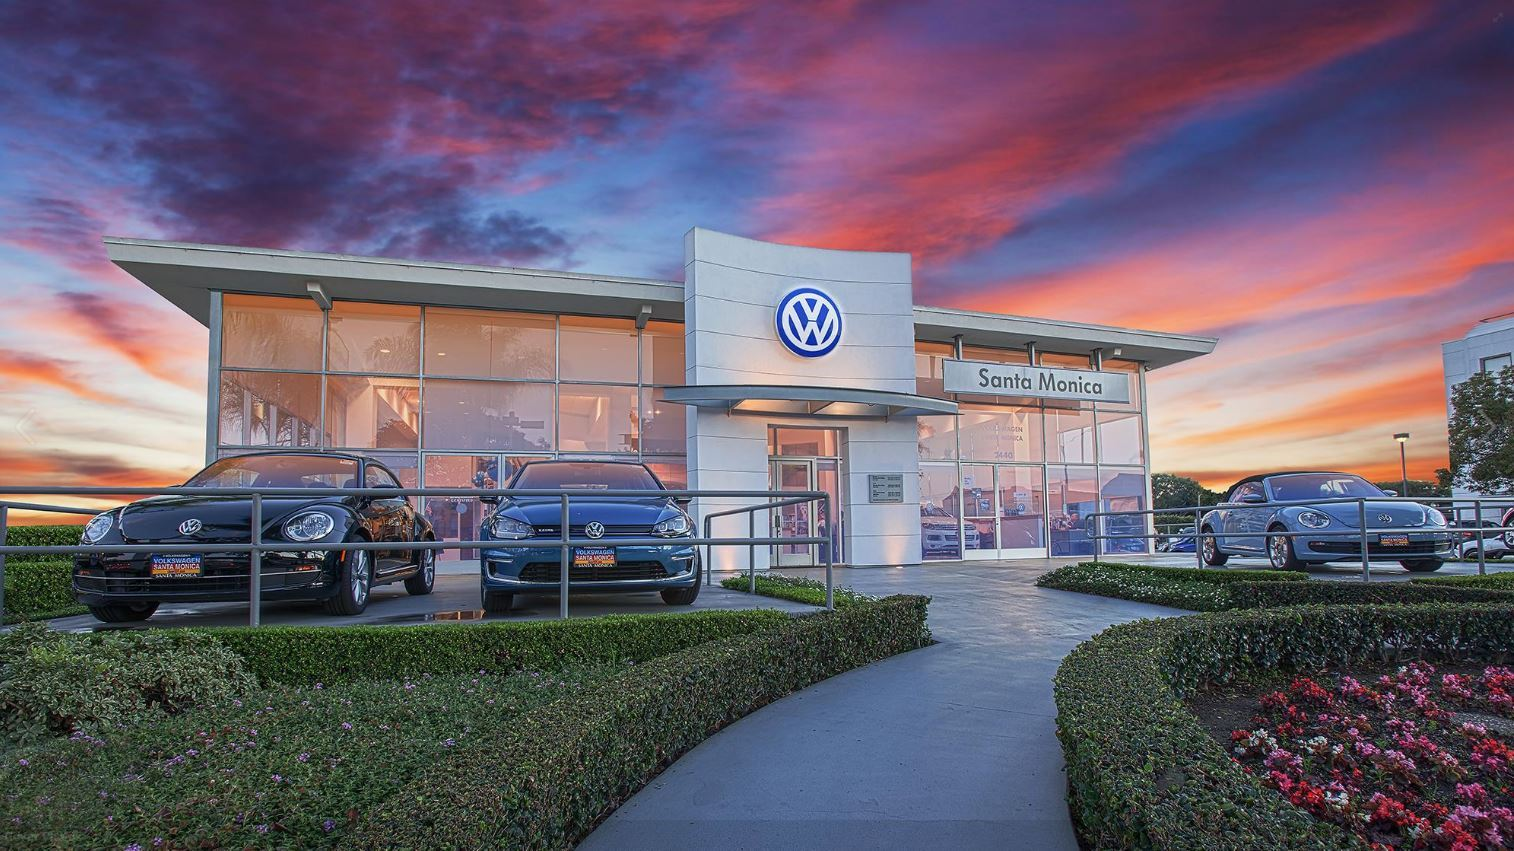 Santa Monica California Volkswagen Dealership